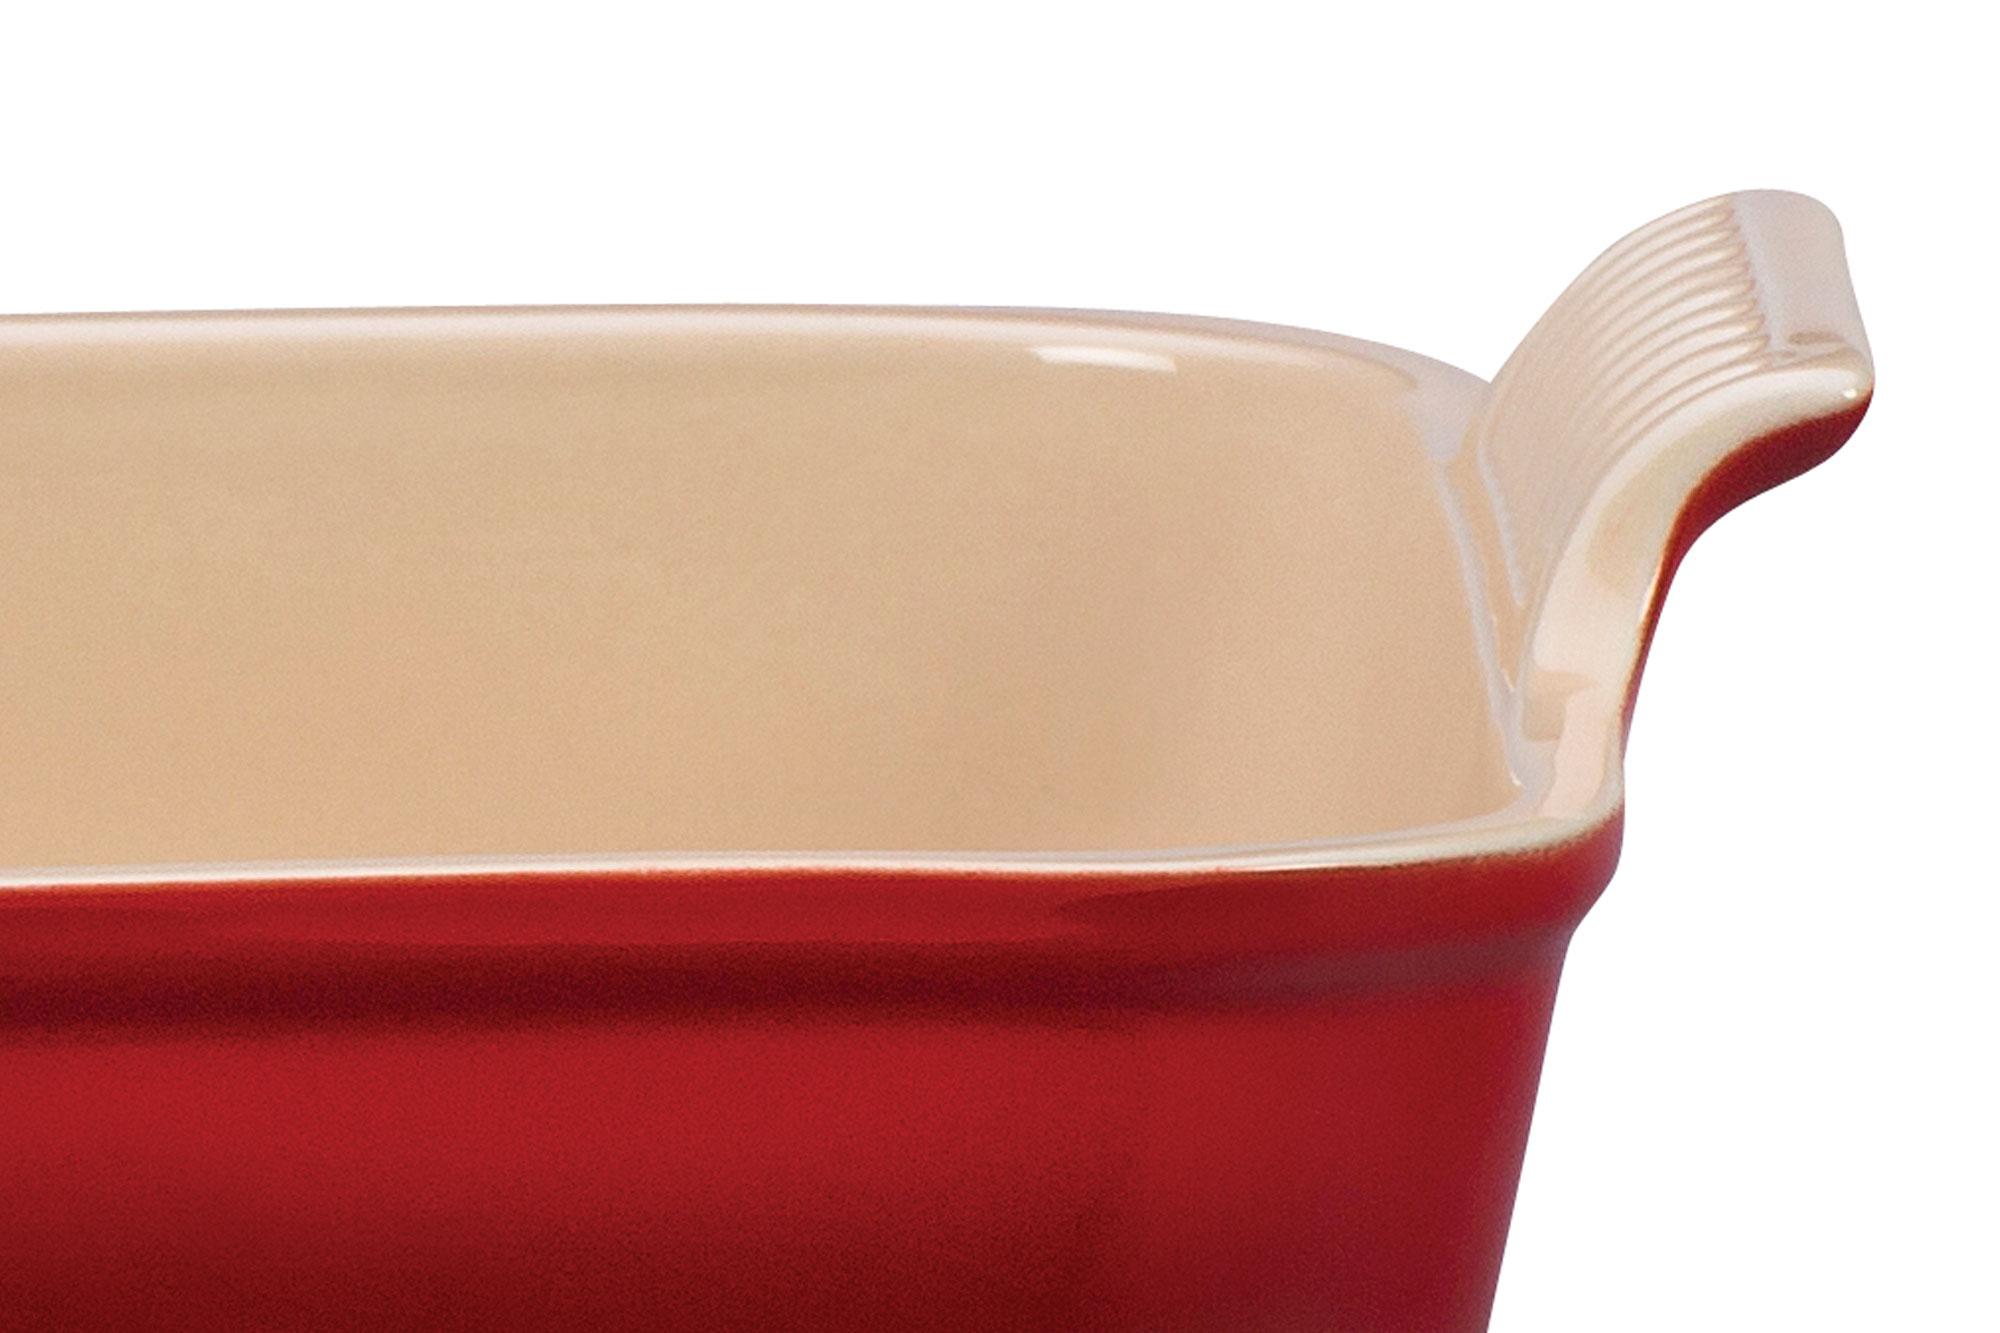 Le Creuset Stoneware Heritage Bakeware Set 3 Piece